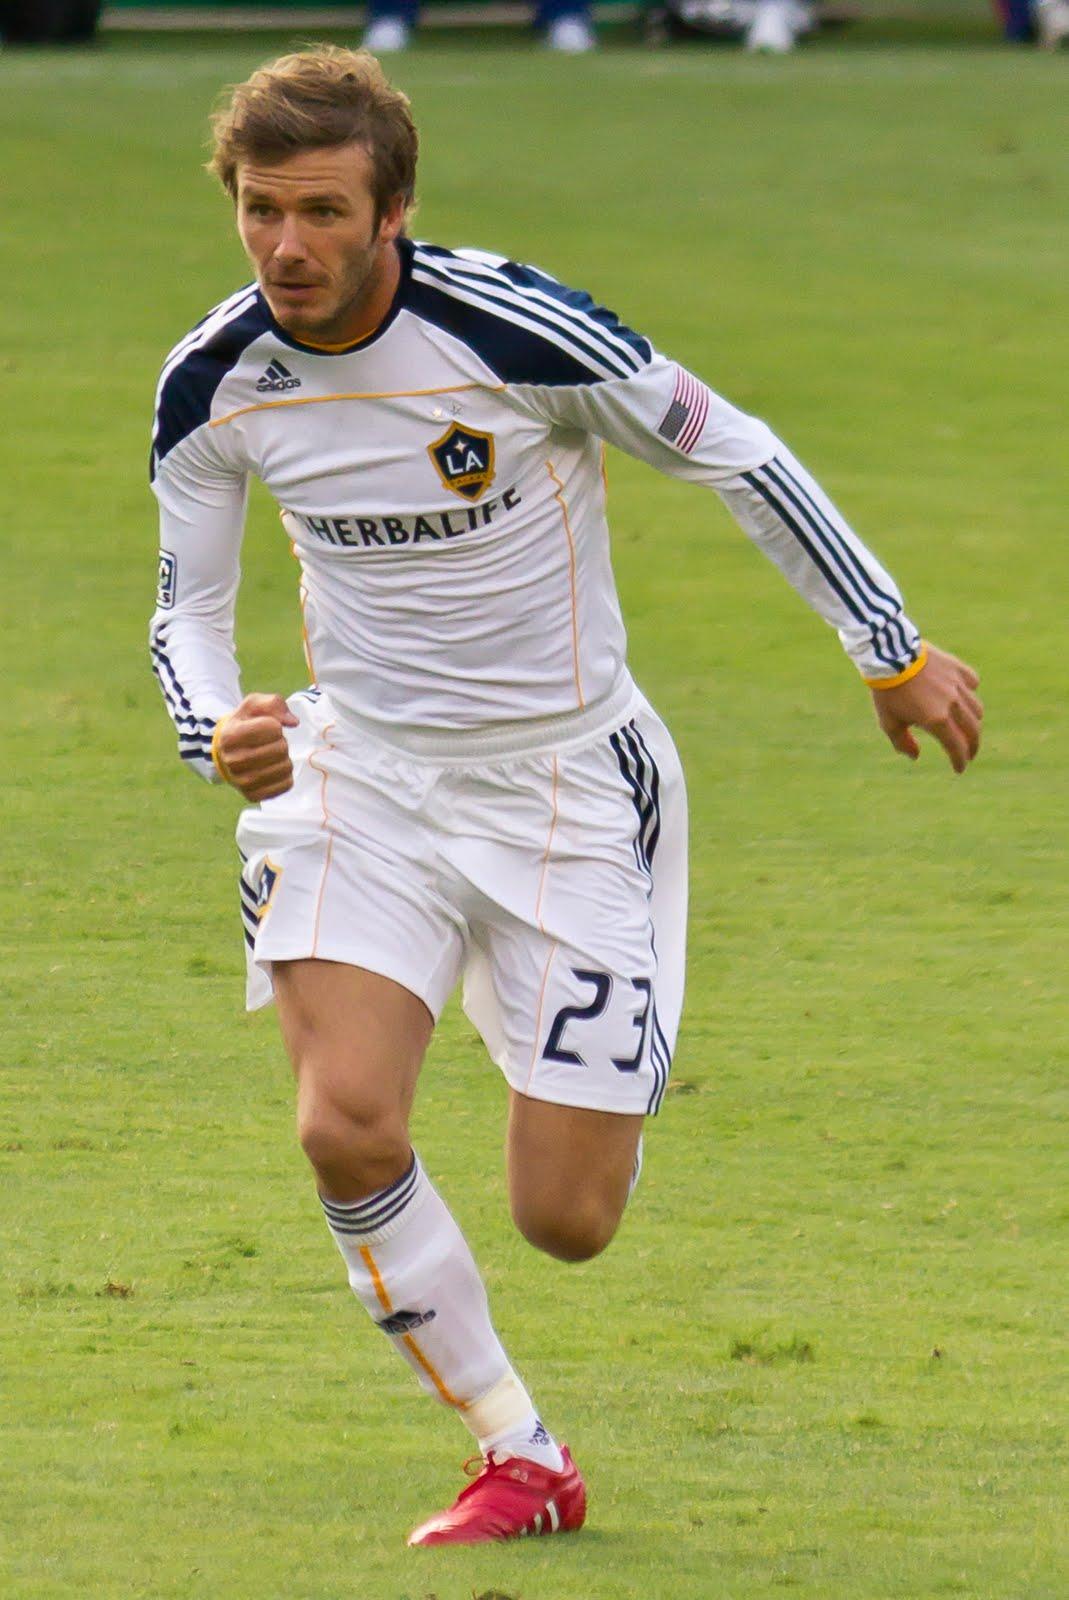 Pro Soccer: David Beckham (England)